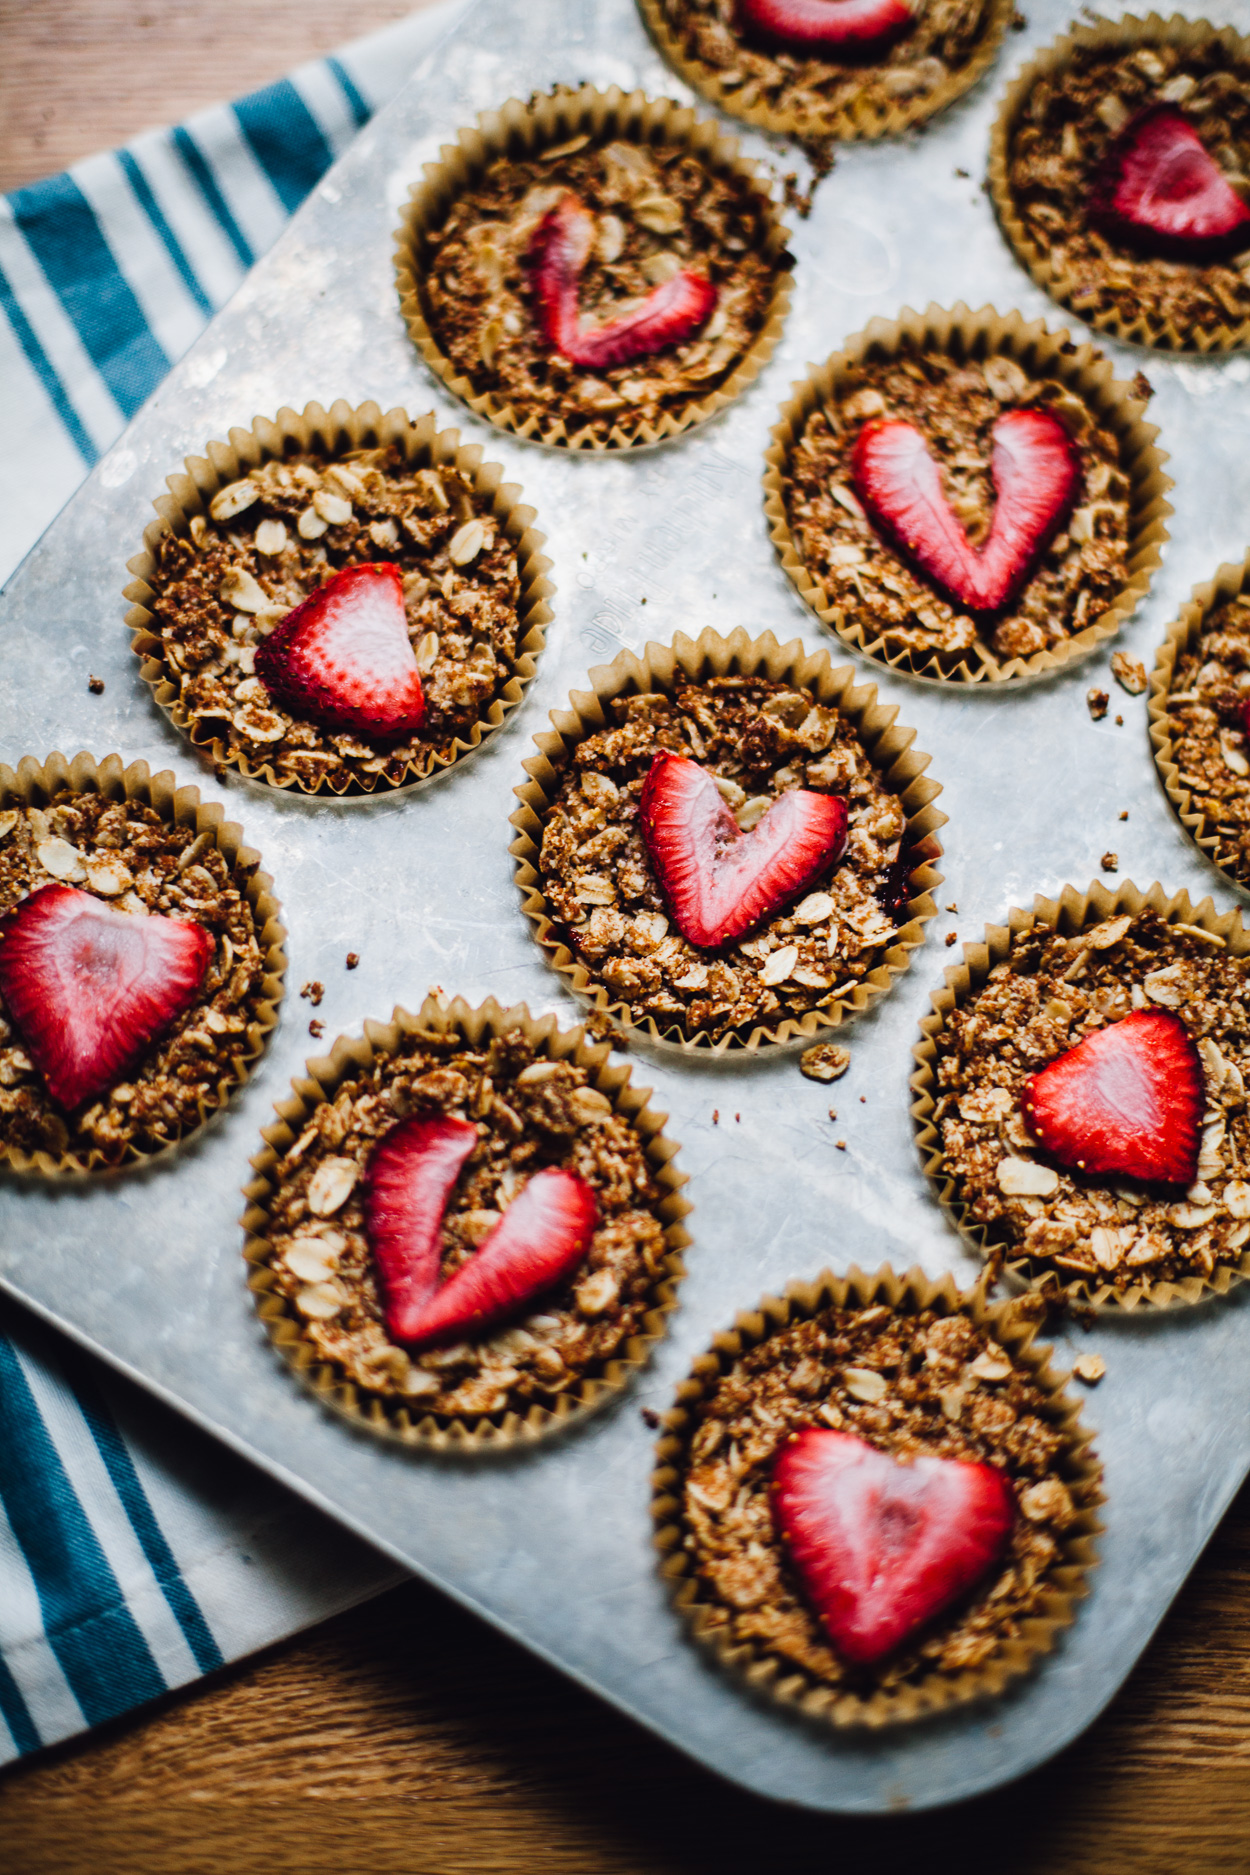 Strawberry rhubarb crumble bites recipe | Girlfriend is Better